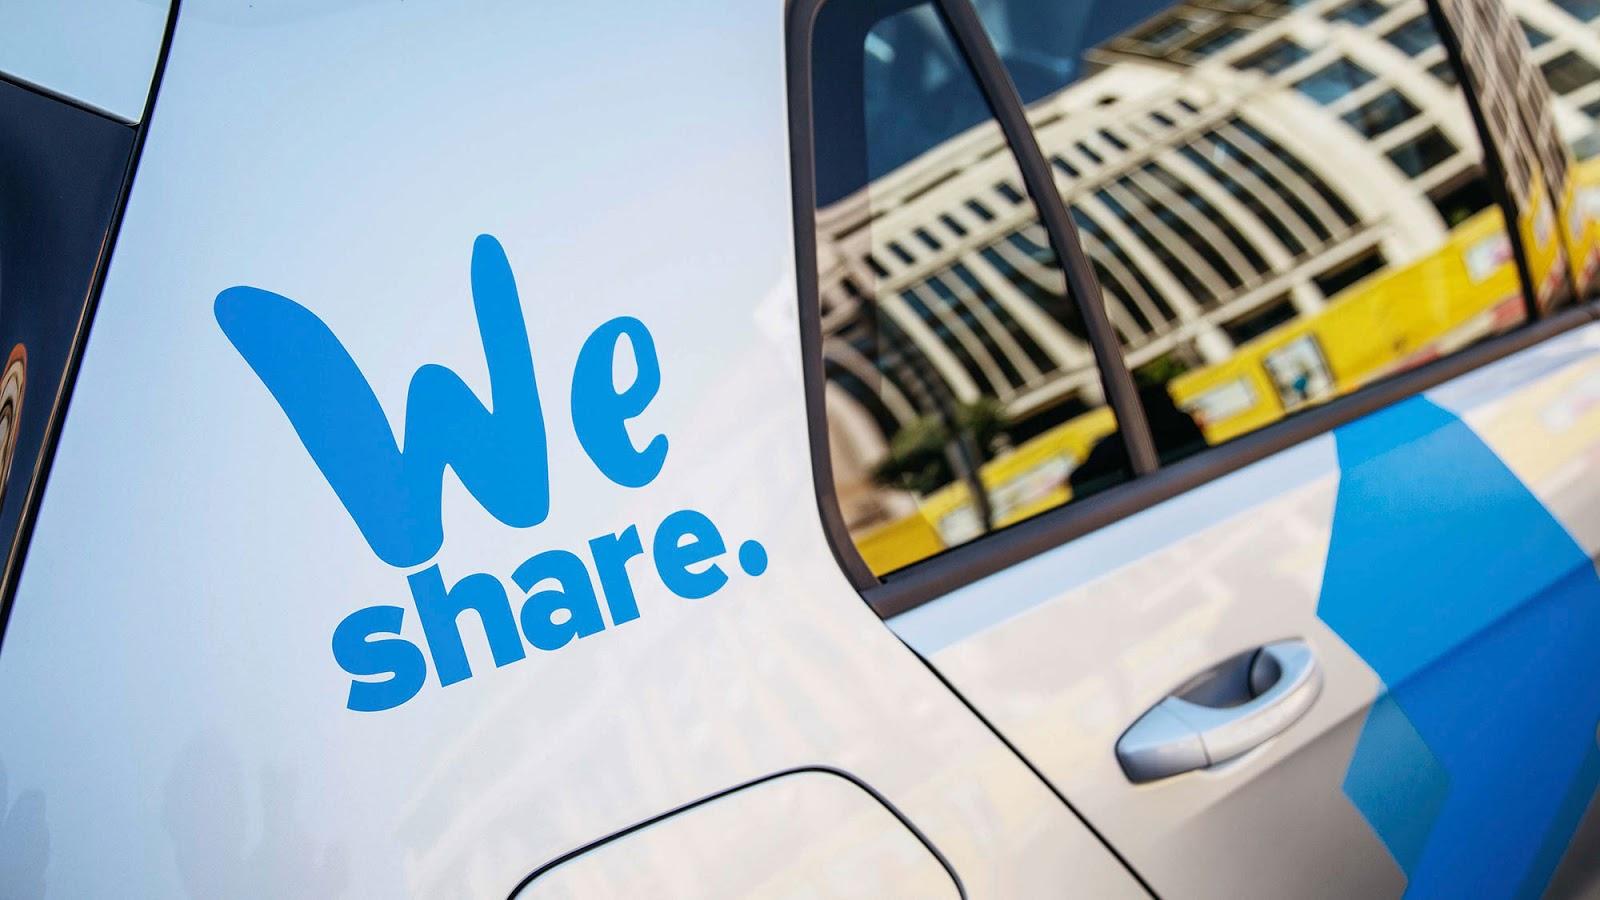 VOLKSWAGEN WESHARE HAMBURG 4 Volkswagen : Ξεκινά car sharing ηλεκτρικών αυτοκινήτων στο Αμβούργο car sharing, Electric cars, electric vehicles, ID.3, Volkswagen, Volkswagen ID.3, VW ID.3, ειδήσεις, ηλεκτρικά, ηλεκτροκινηση